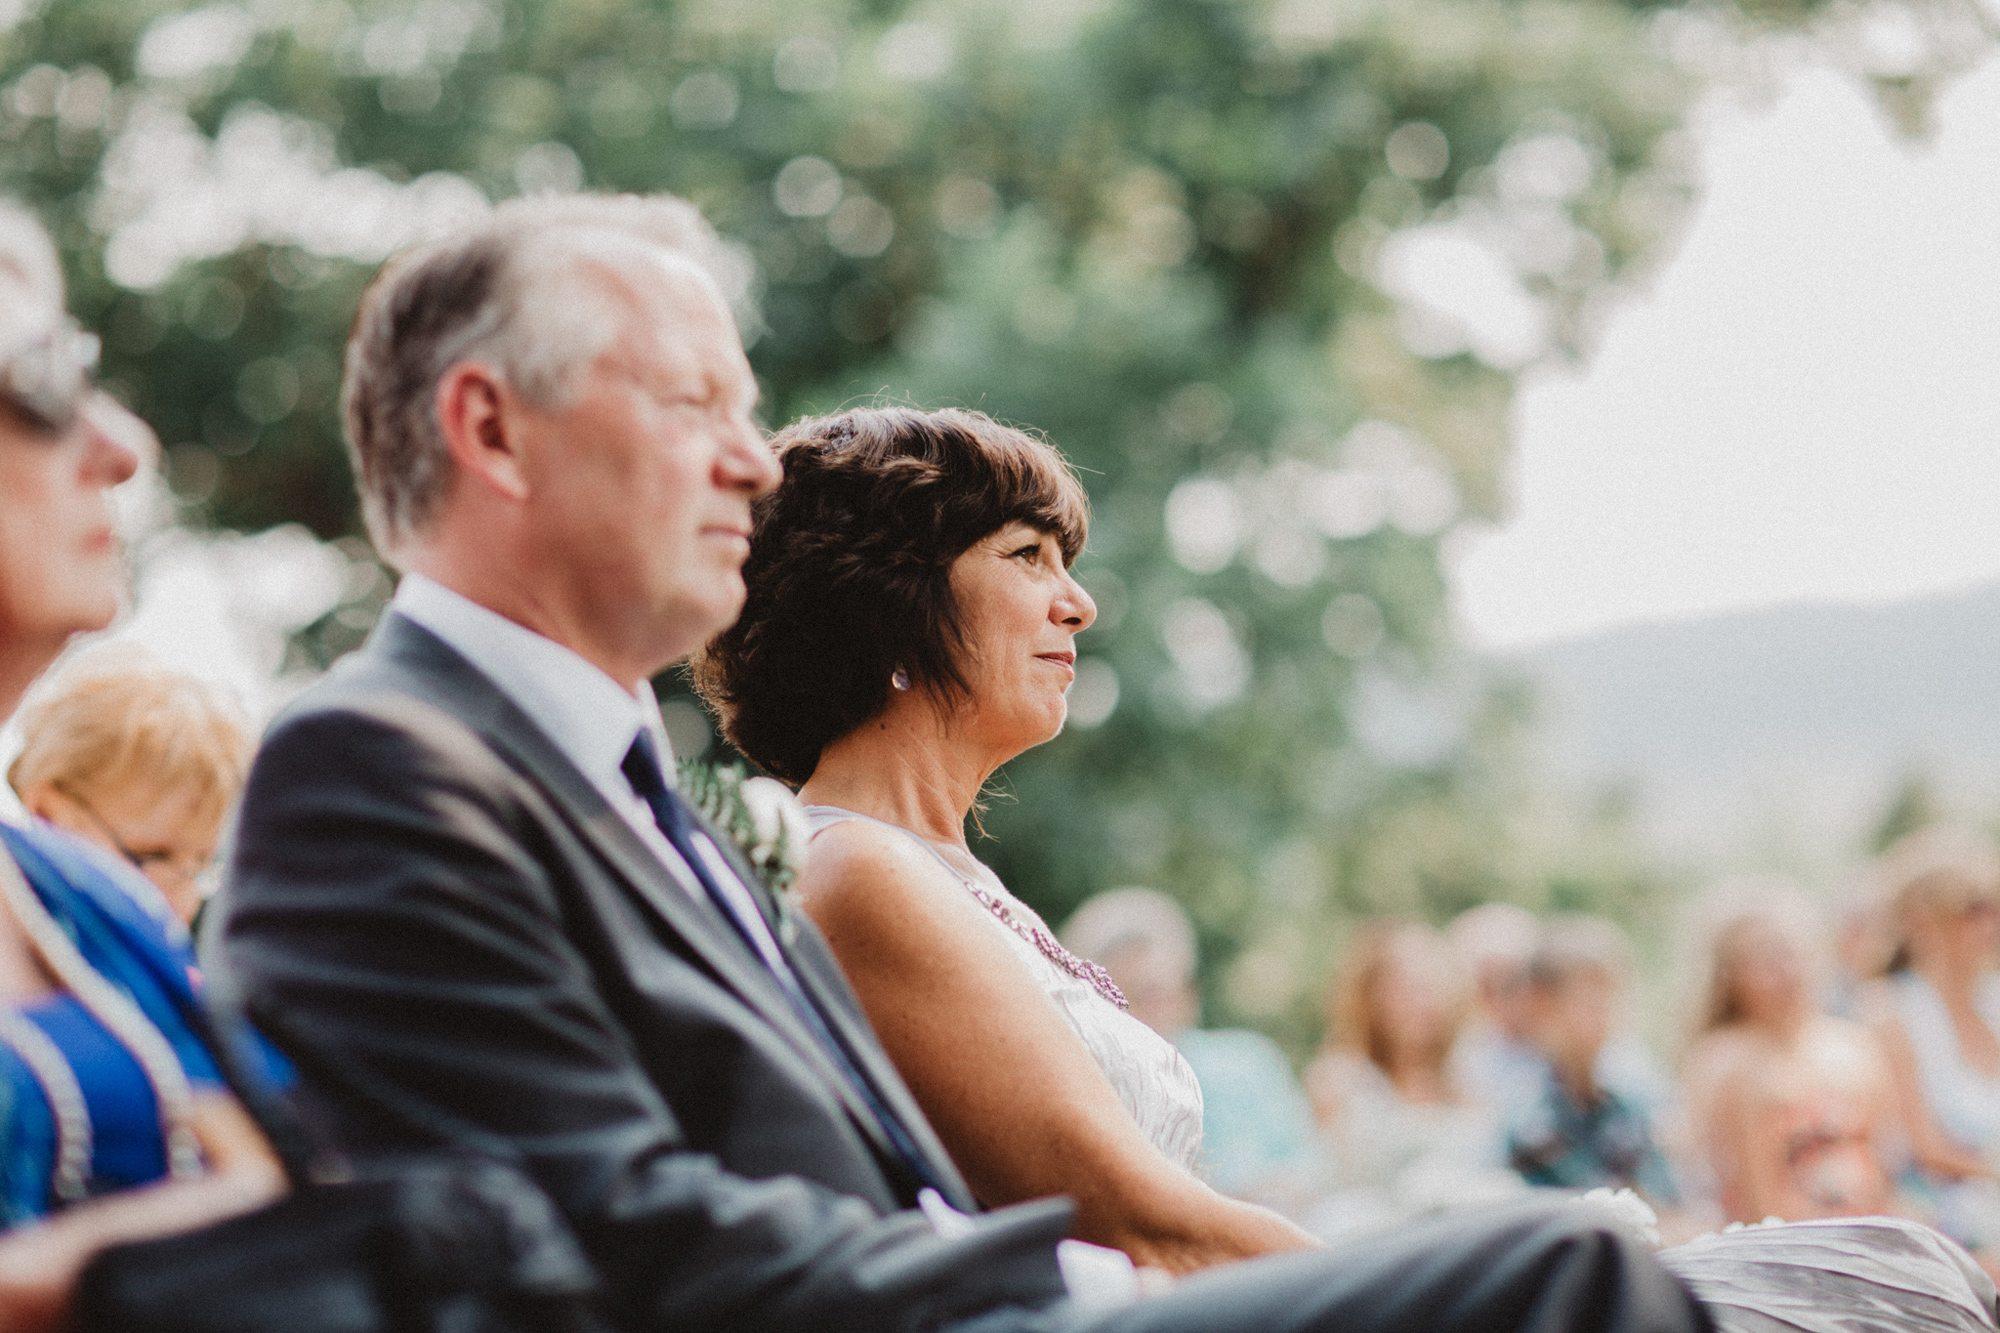 456-vernon-wedding-photographer